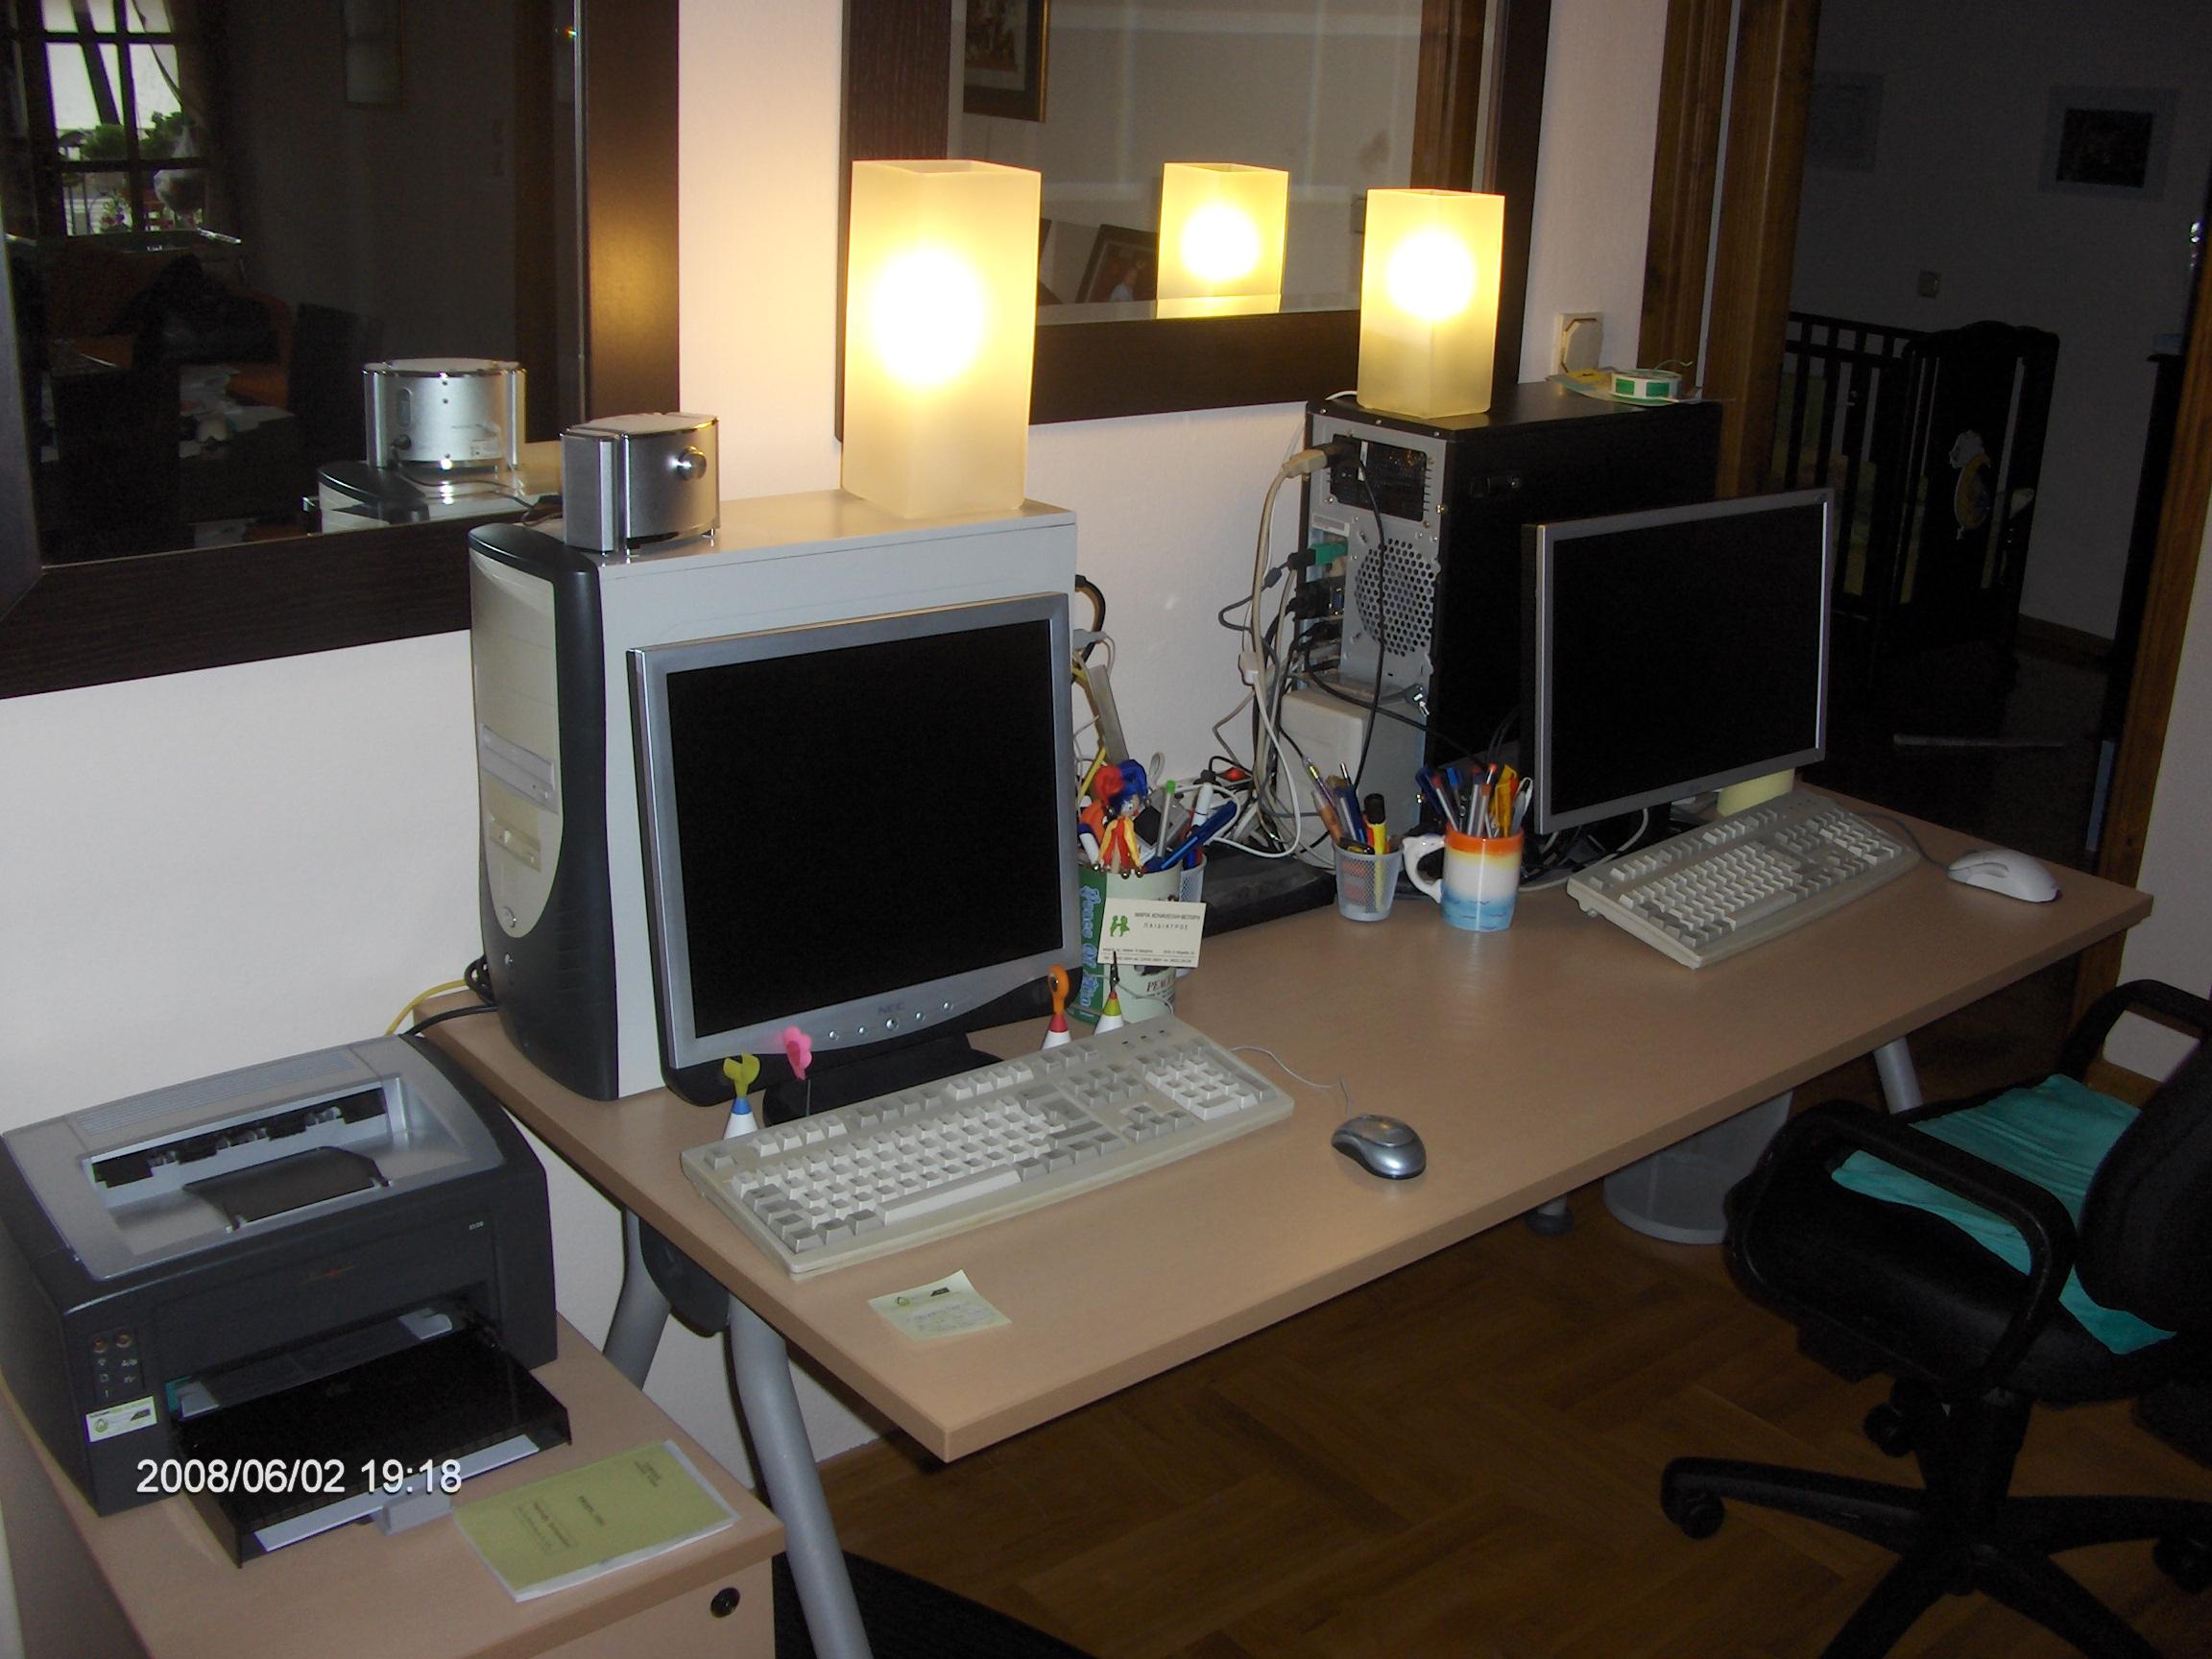 Current physical desktop